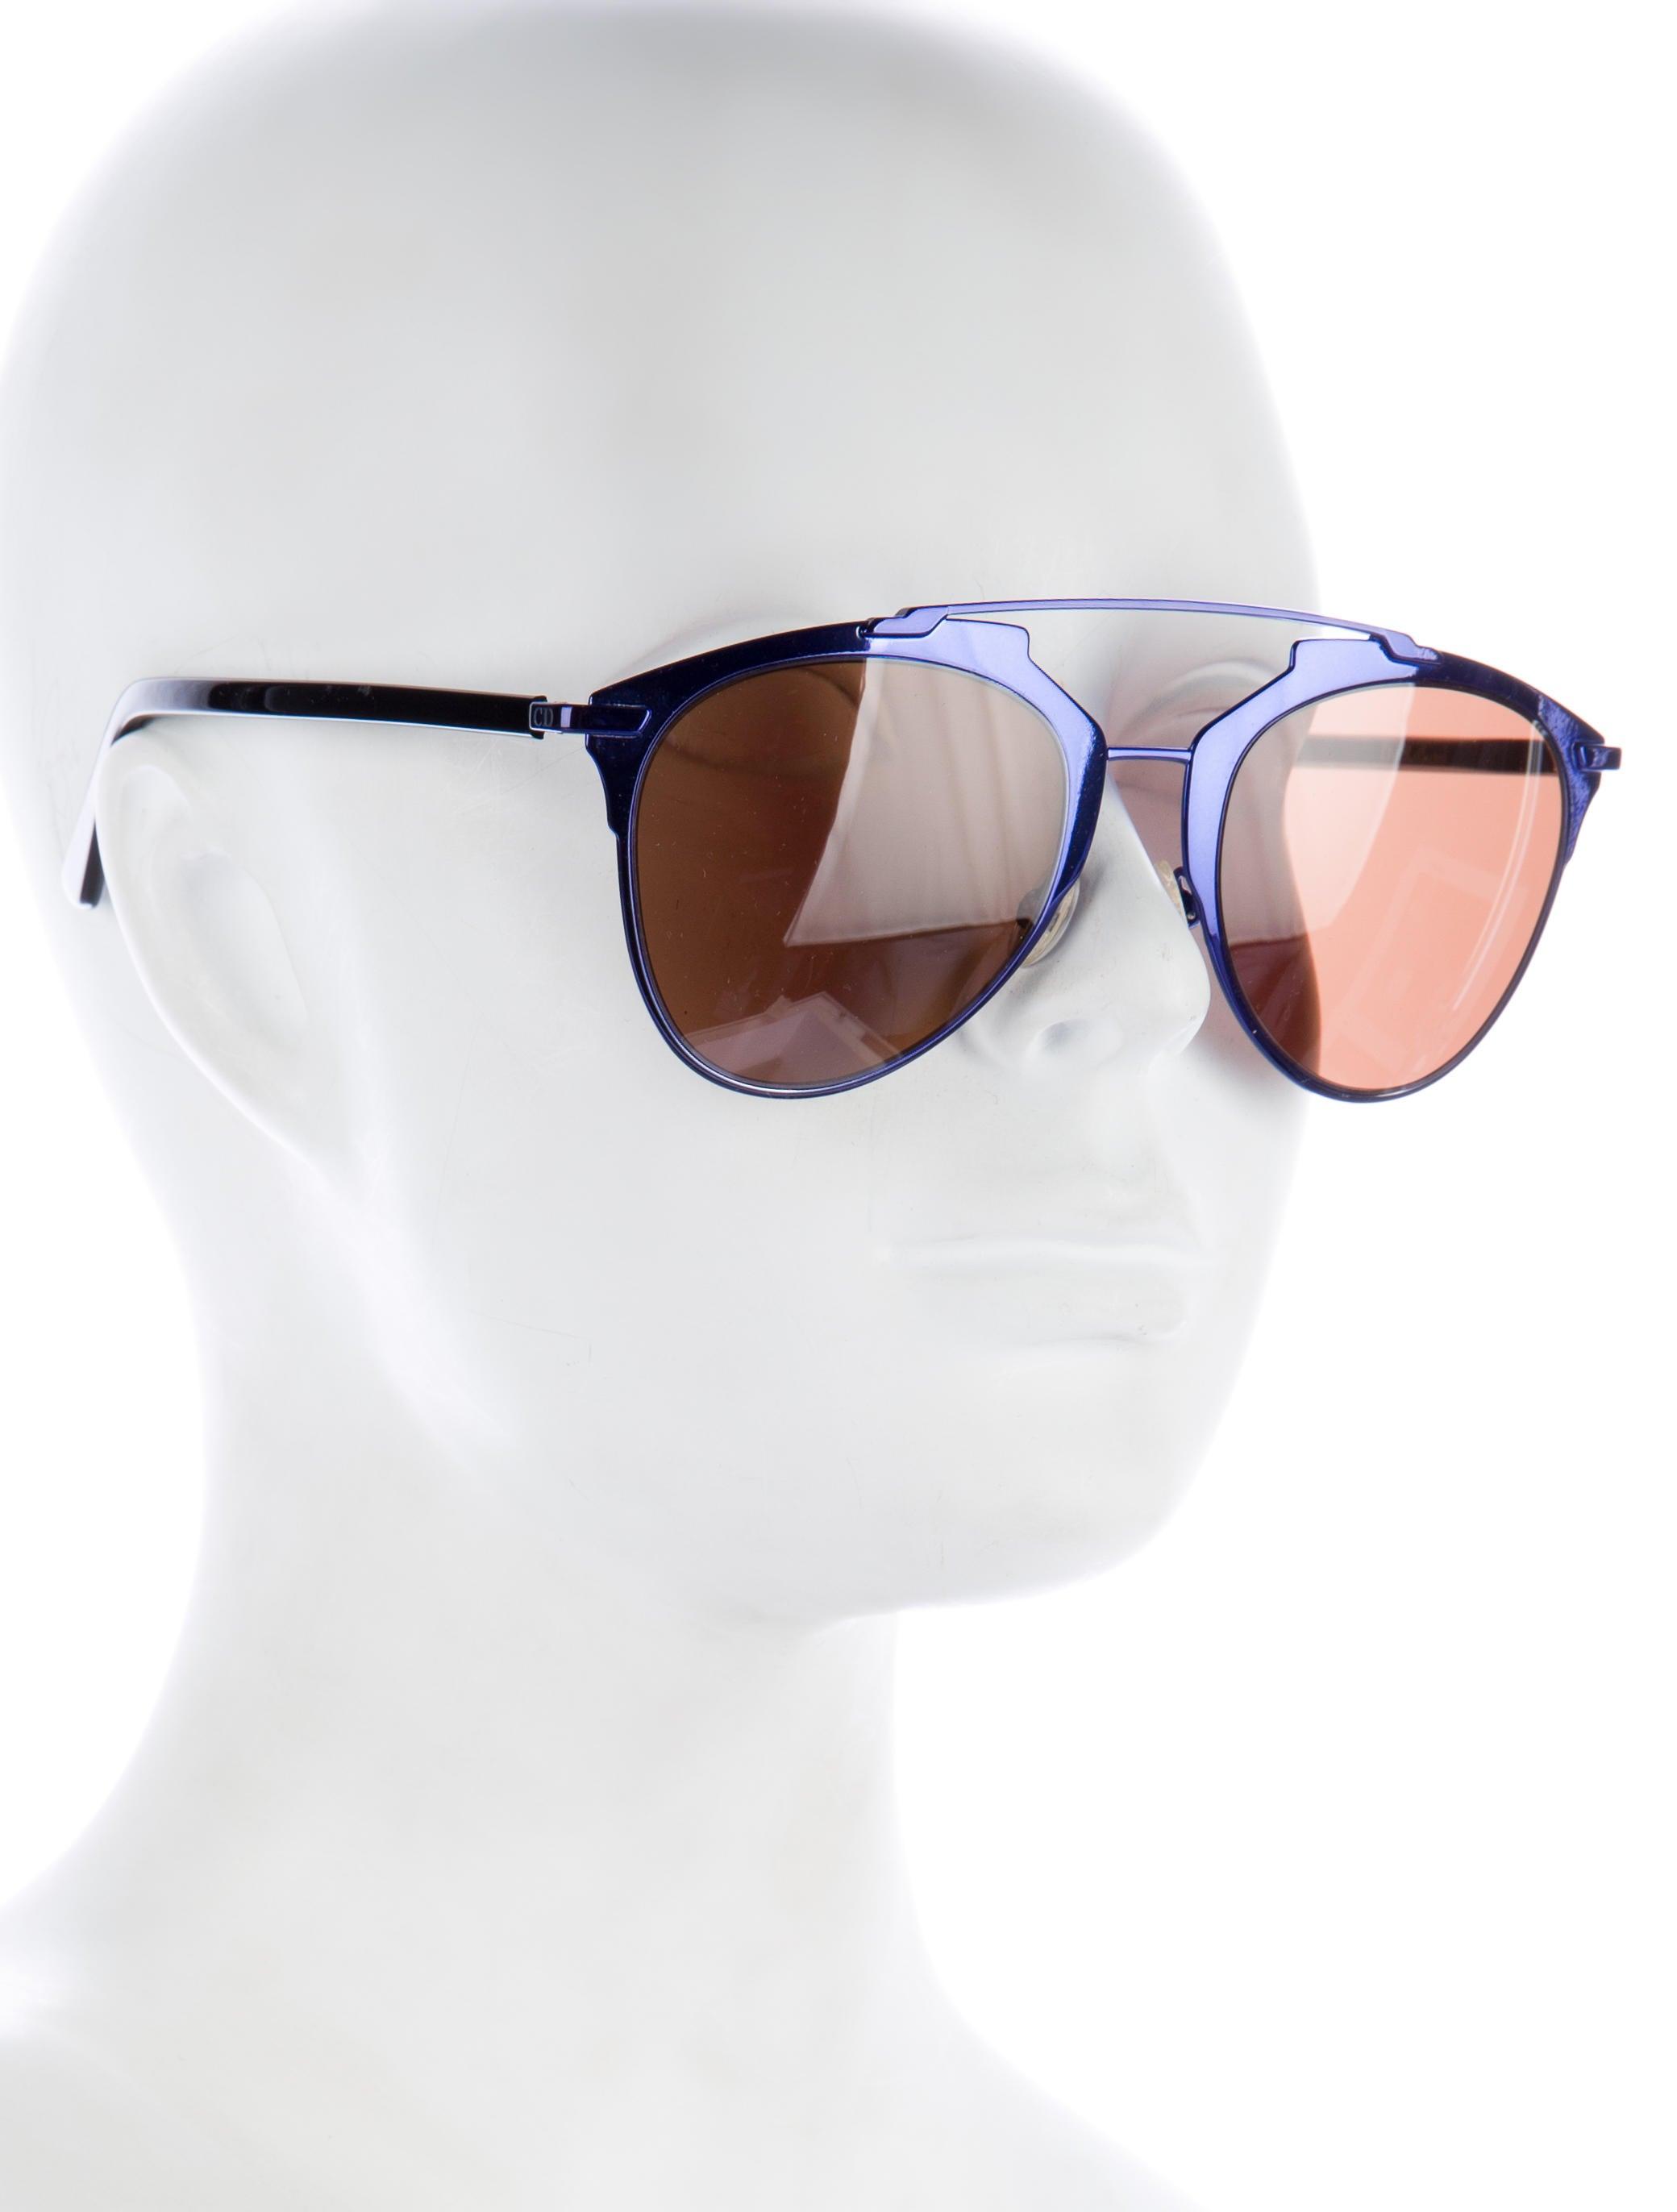 e53db0aef2a Christian Dior So Real Sunglasses